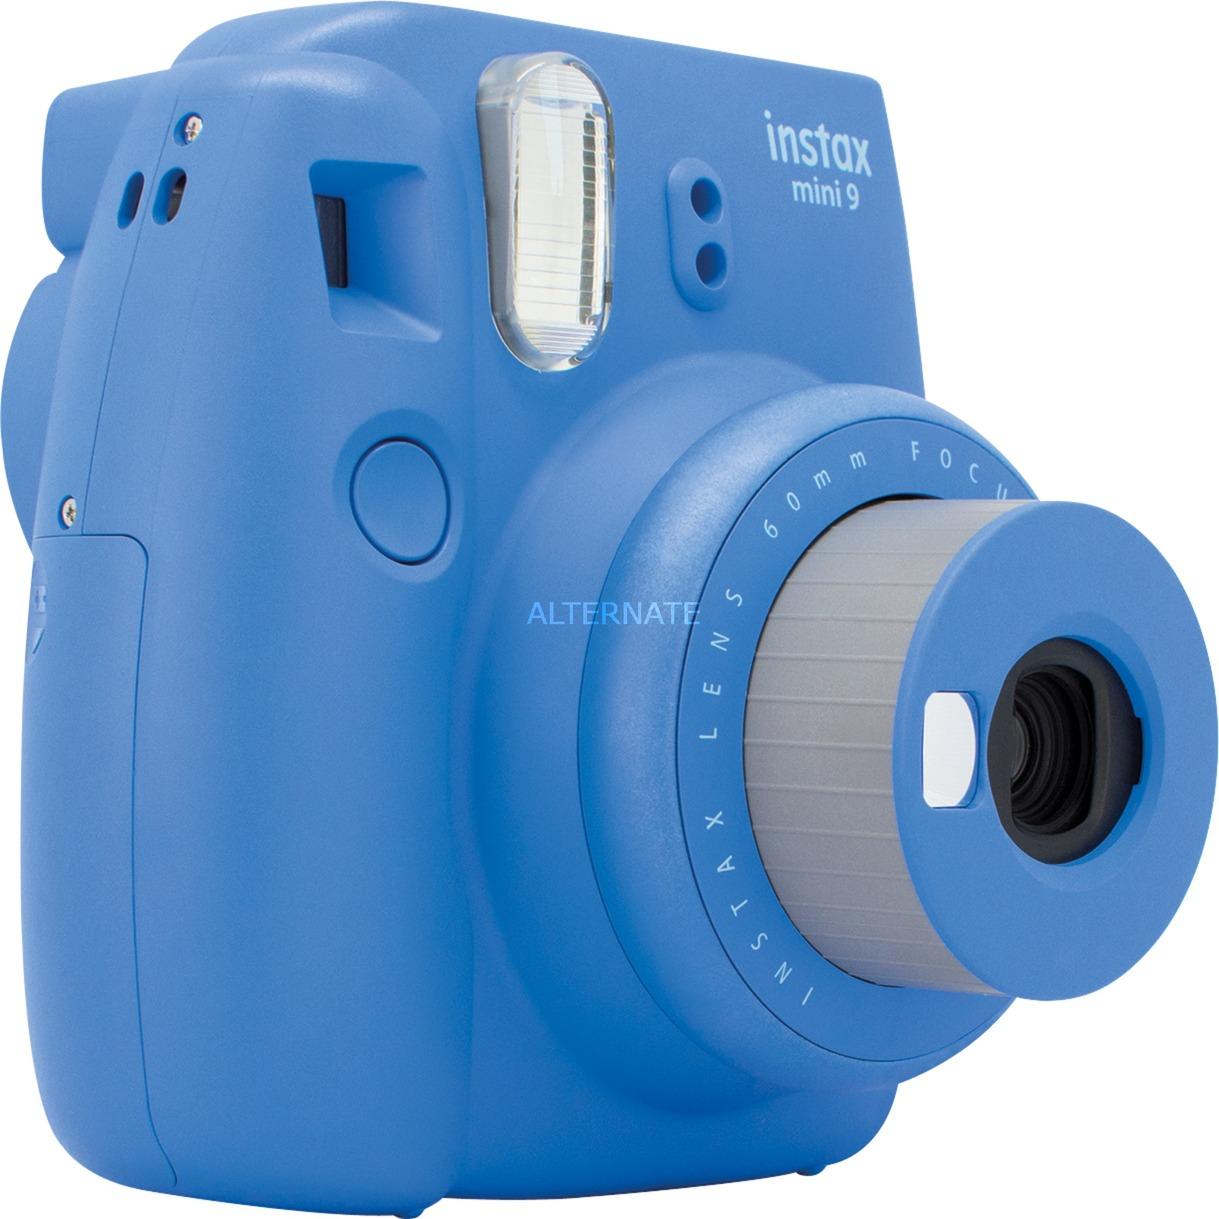 Instax Mini 9 cámara instantánea impresión 62 x 46 mm Azul